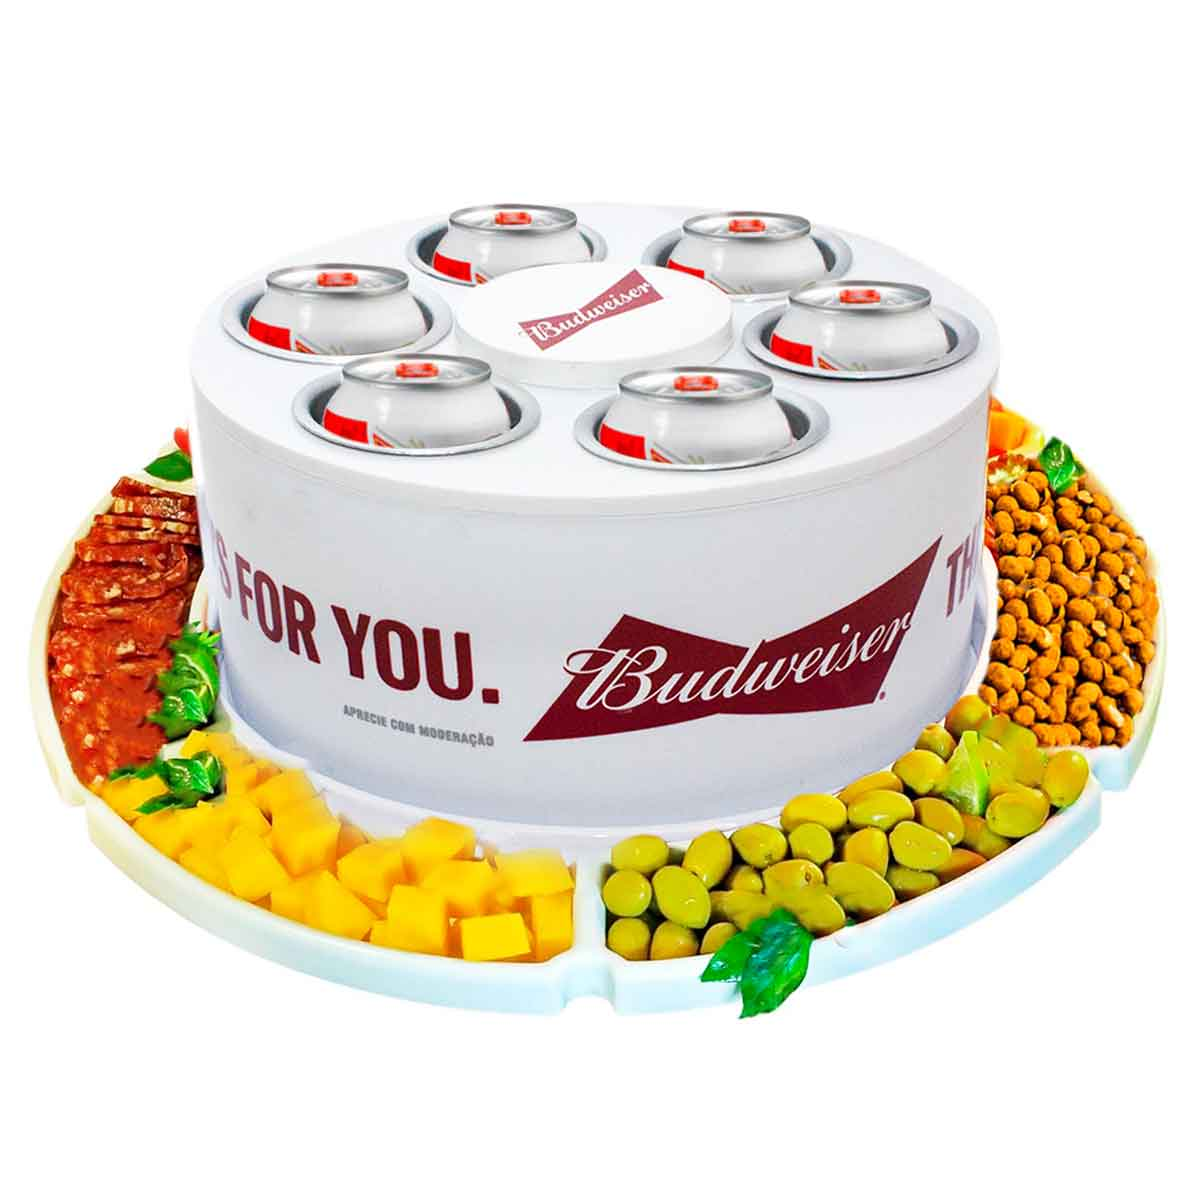 KIT Cooler 3G Budweiser 6 Latas Cerveja + Petisqueira Giratória